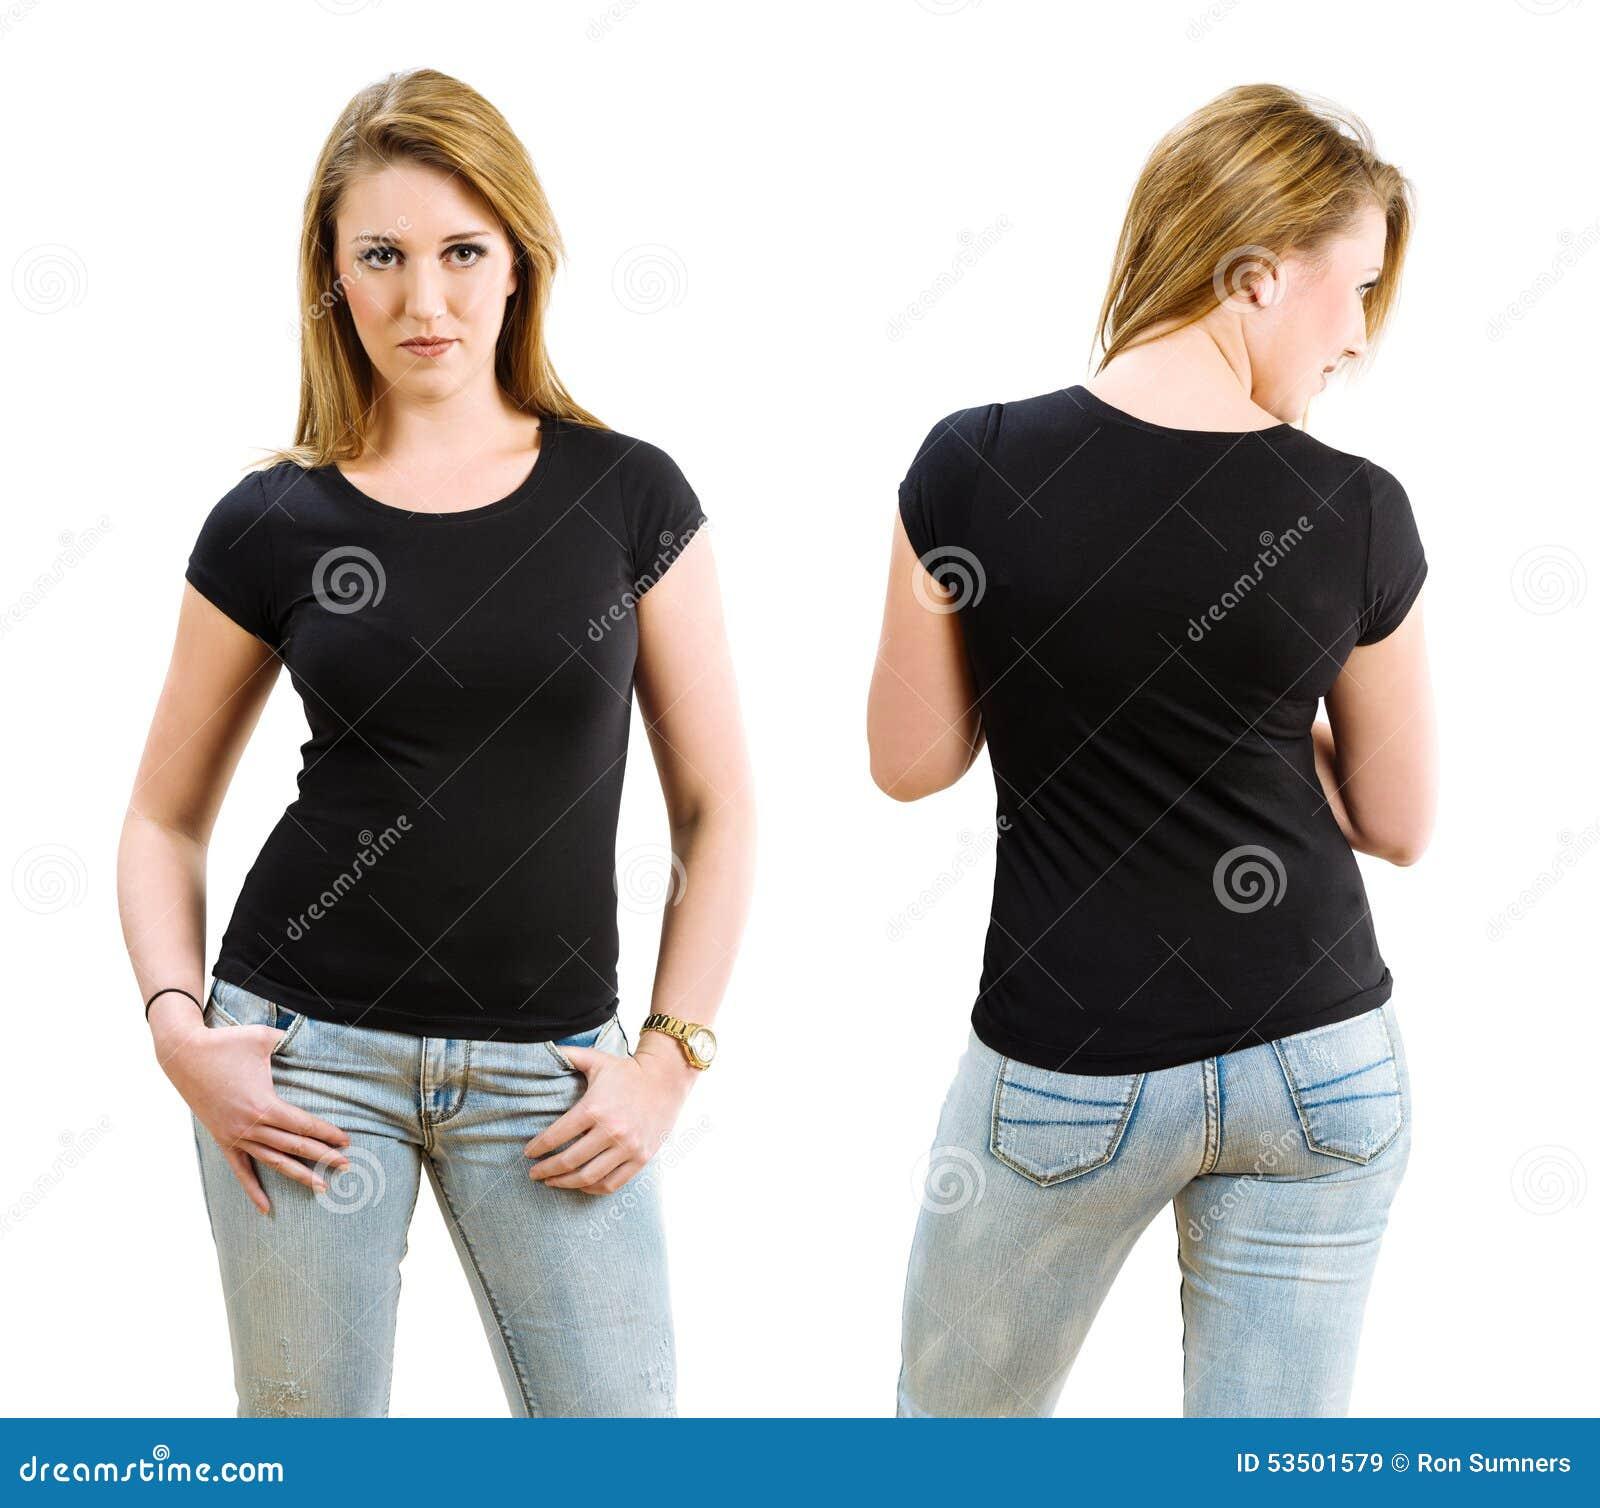 Blank TShirts Polo Shirts Hoodies Tank Tops and more